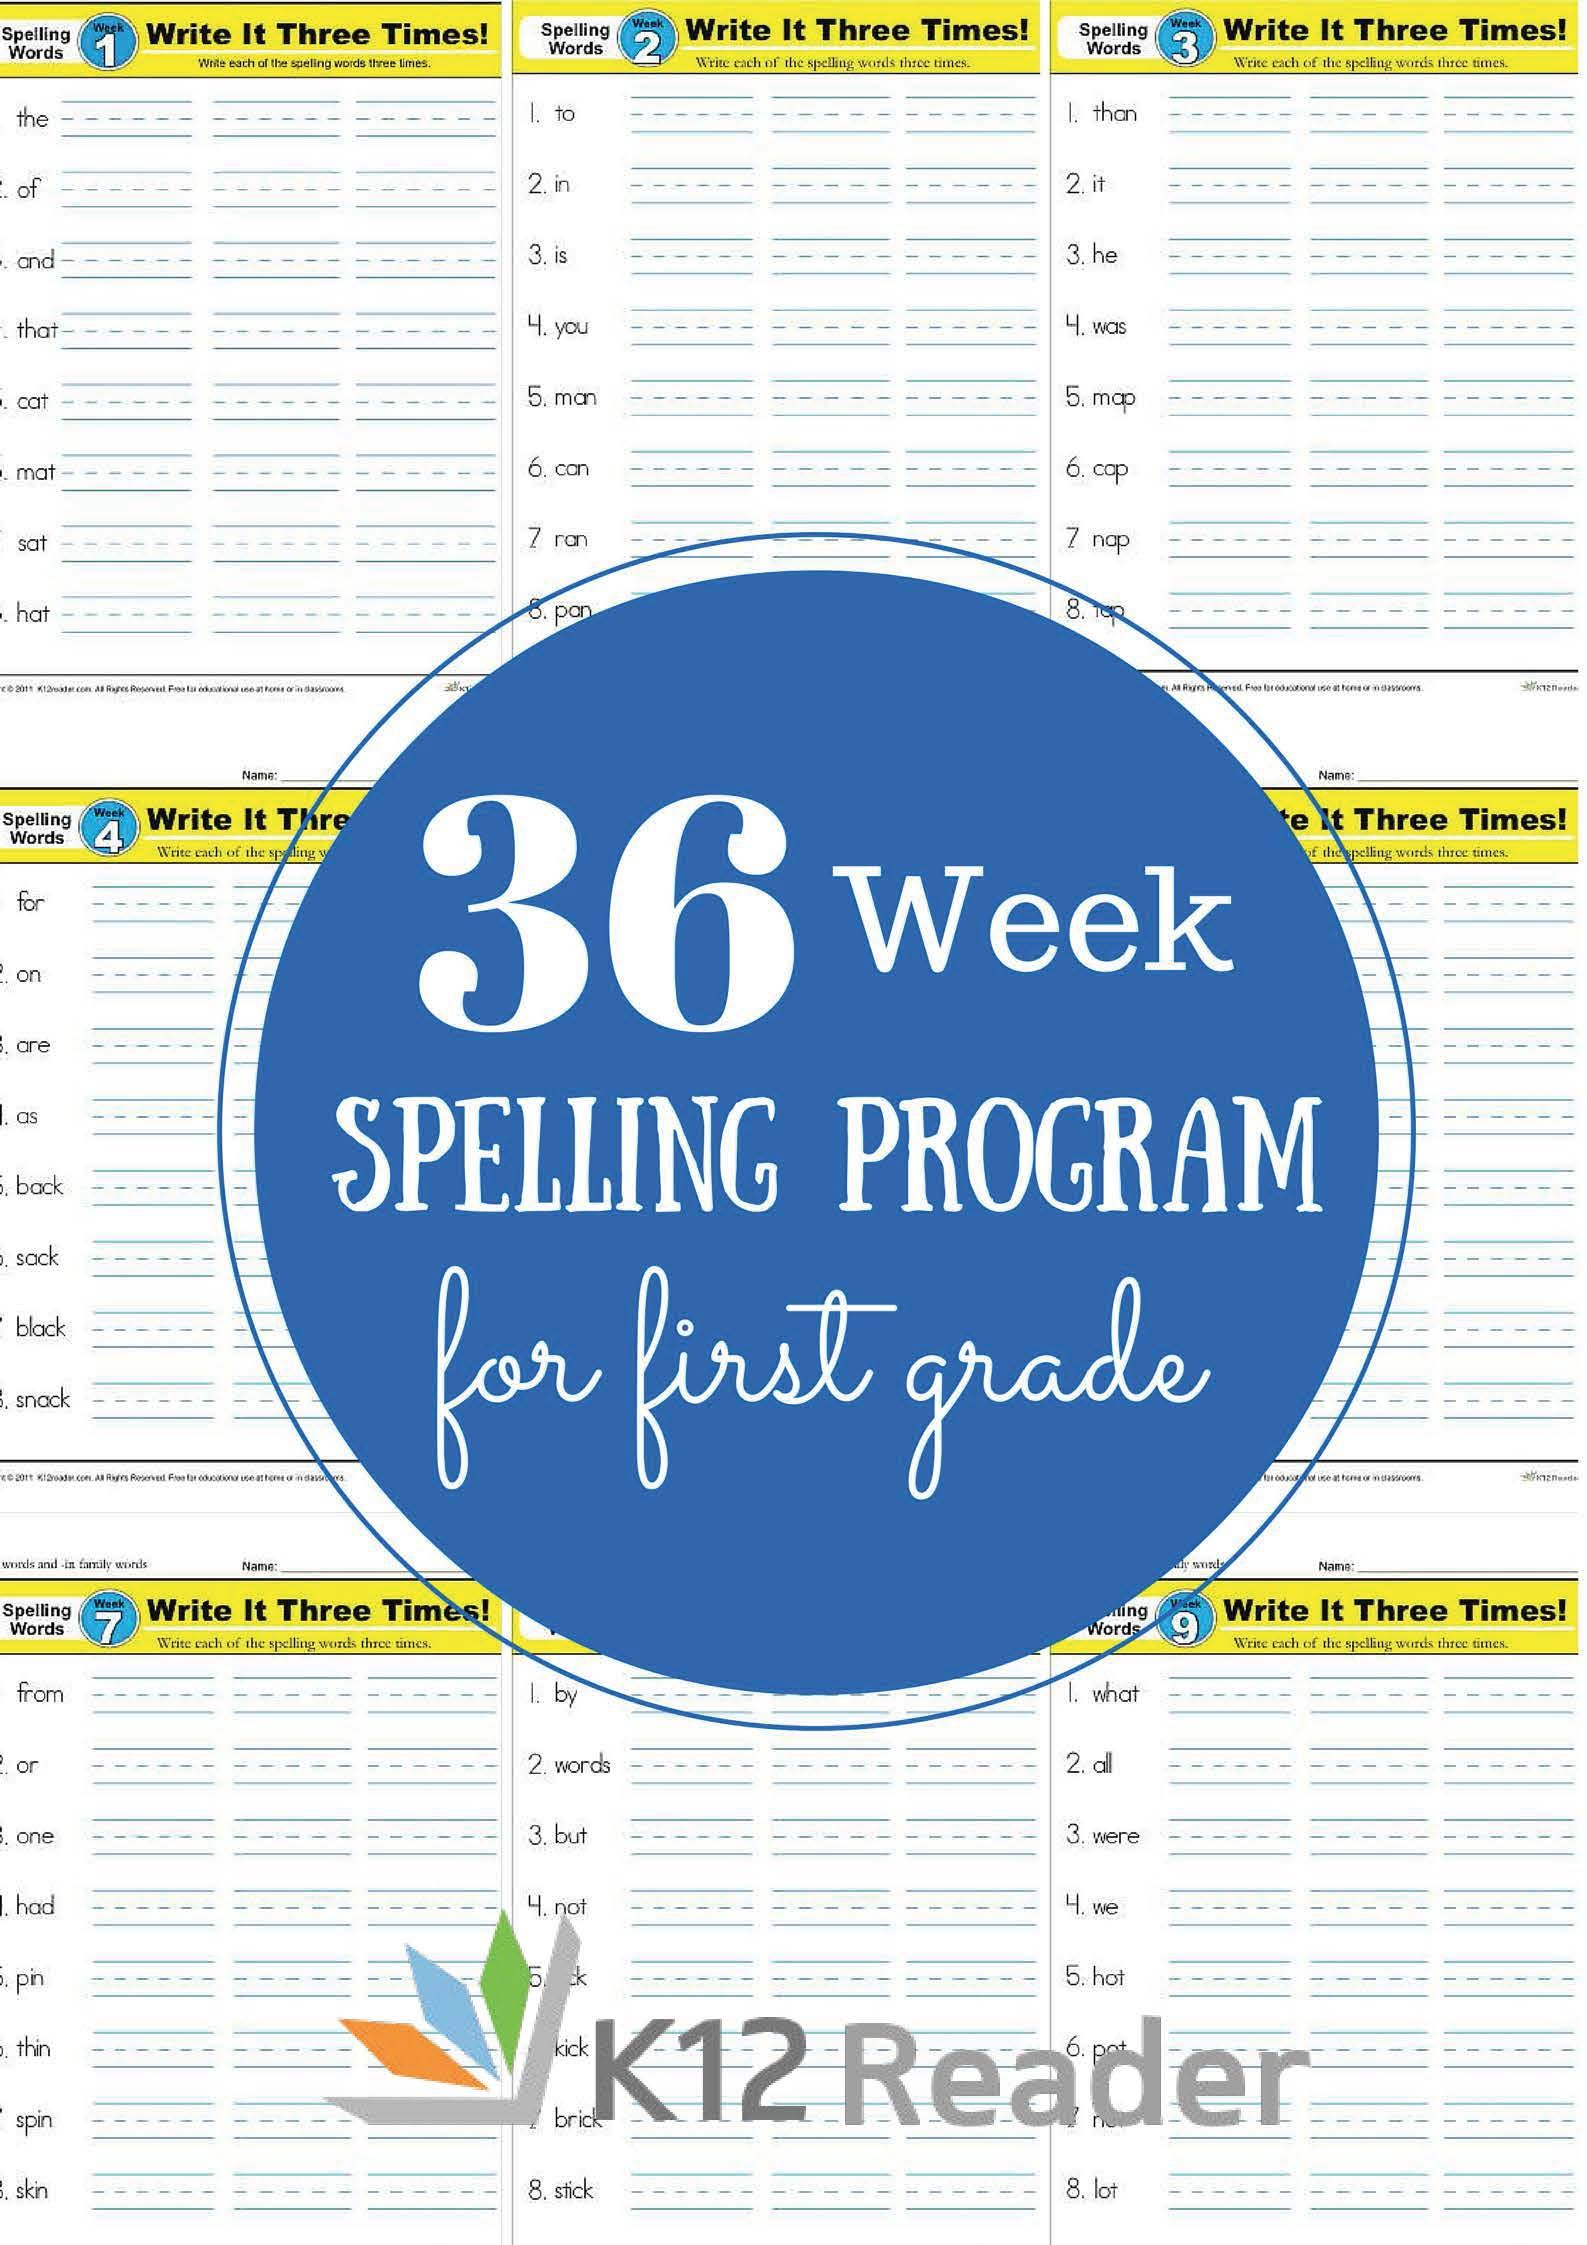 first grade spelling words free 1st grade weekly list worksheets spelling worksheets. Black Bedroom Furniture Sets. Home Design Ideas